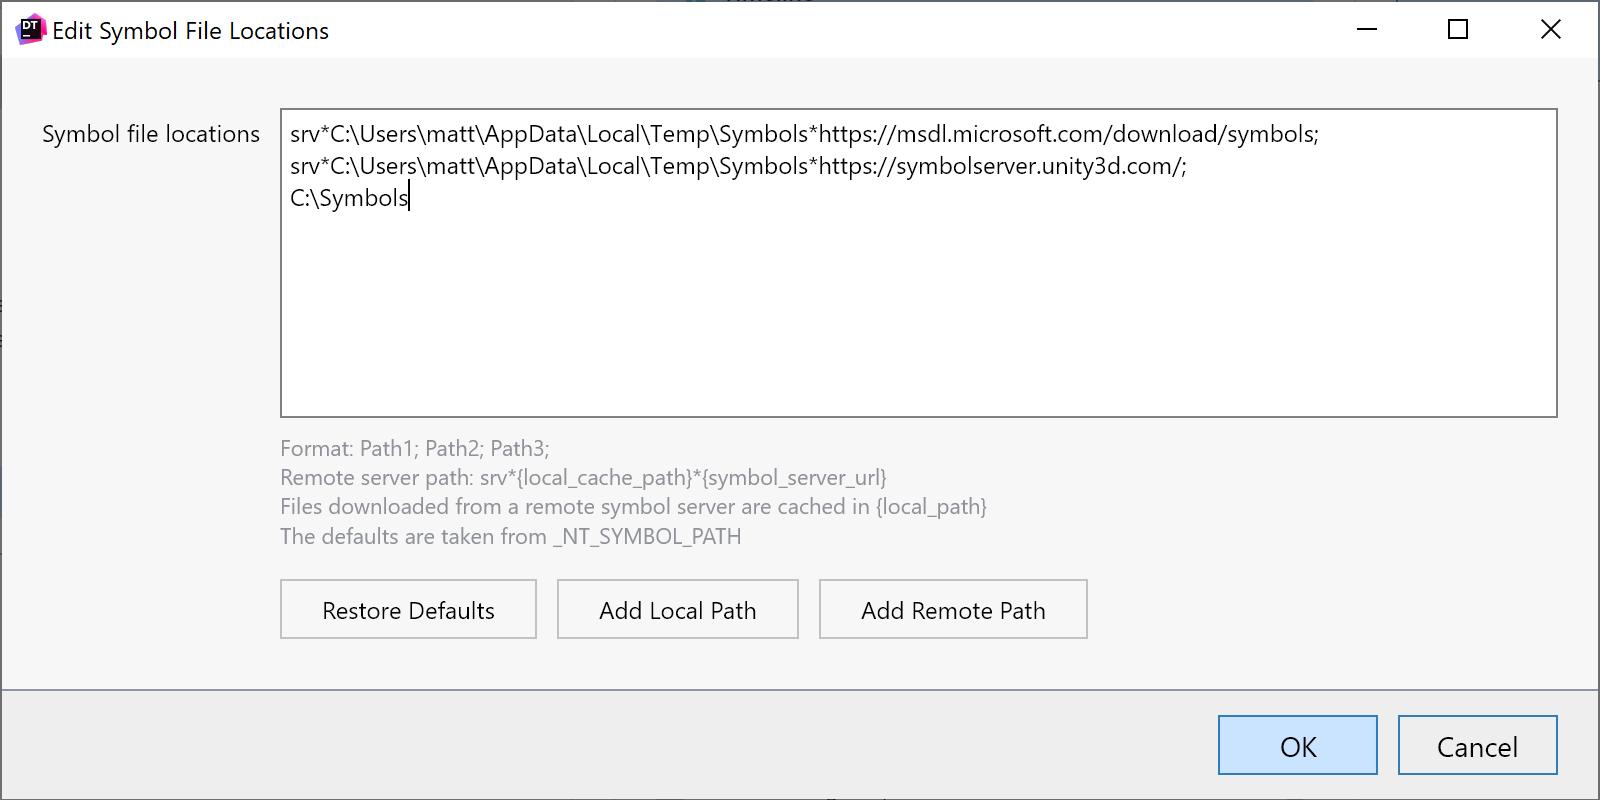 Symbol file location options dialog